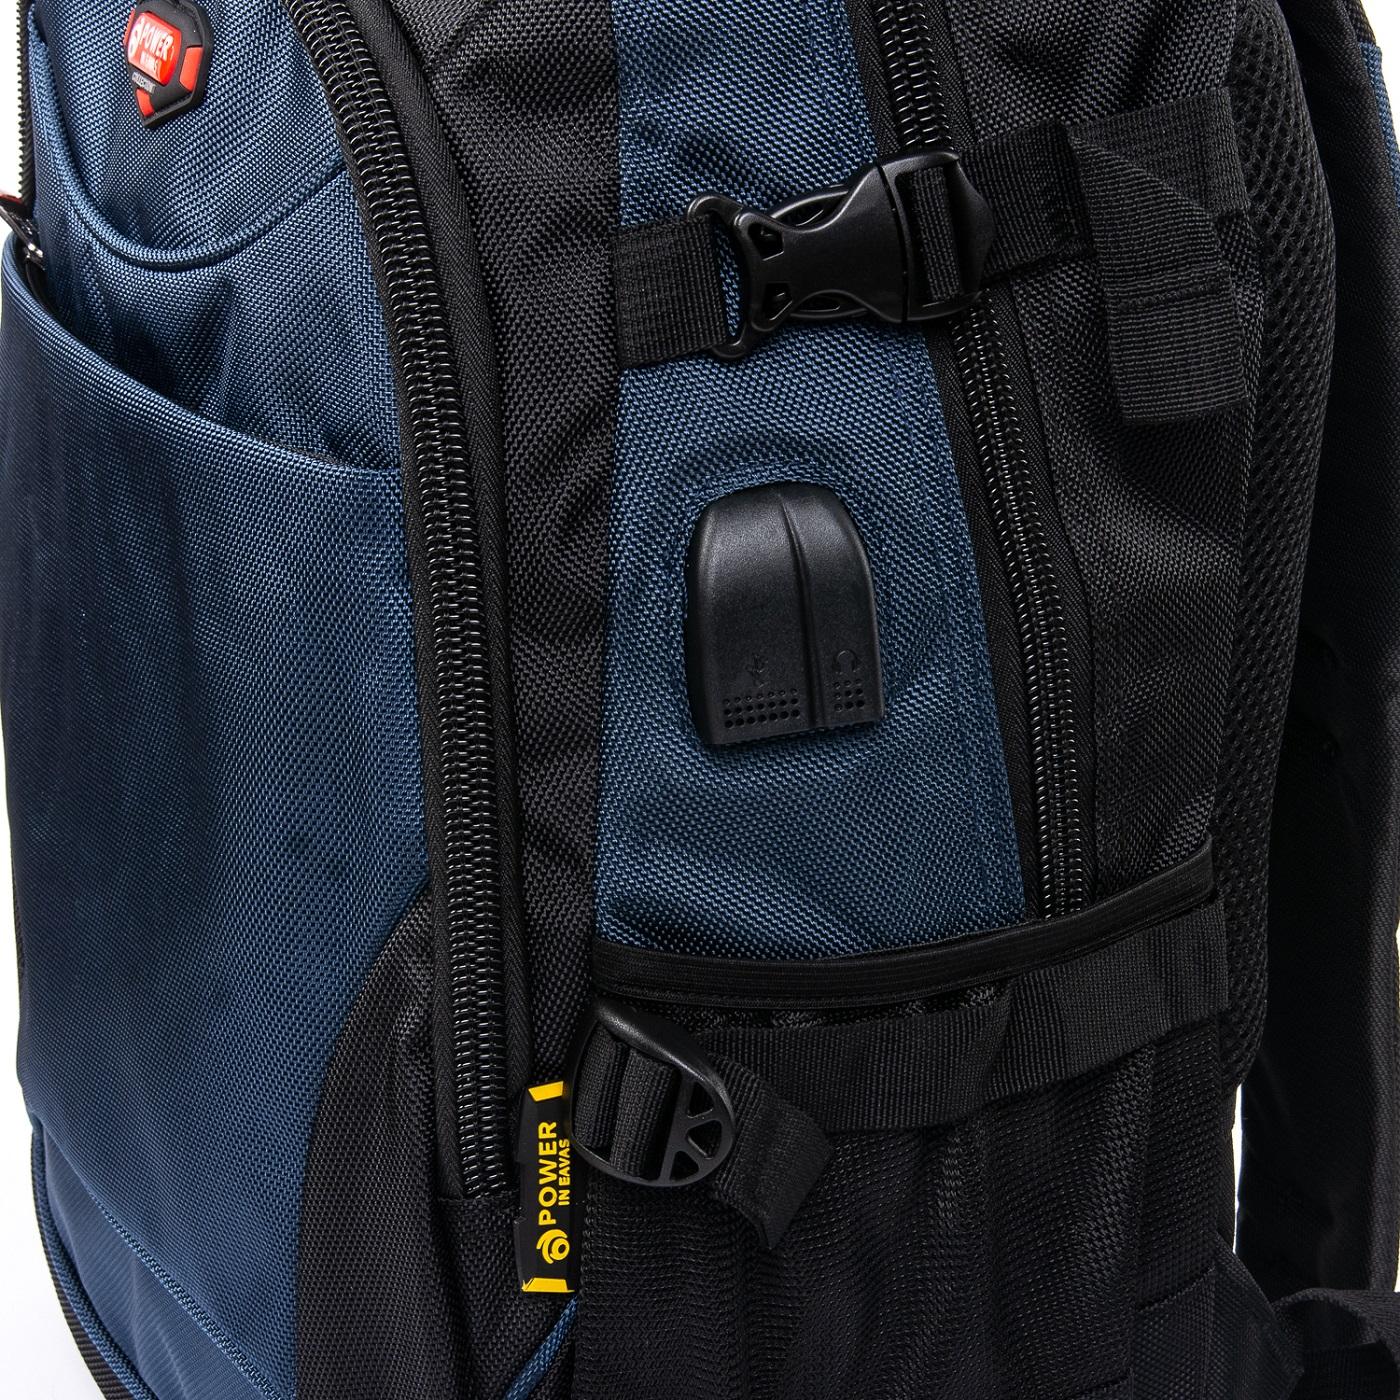 Рюкзак Городской нейлон Power In Eavas 9629 black-blue - фото 3